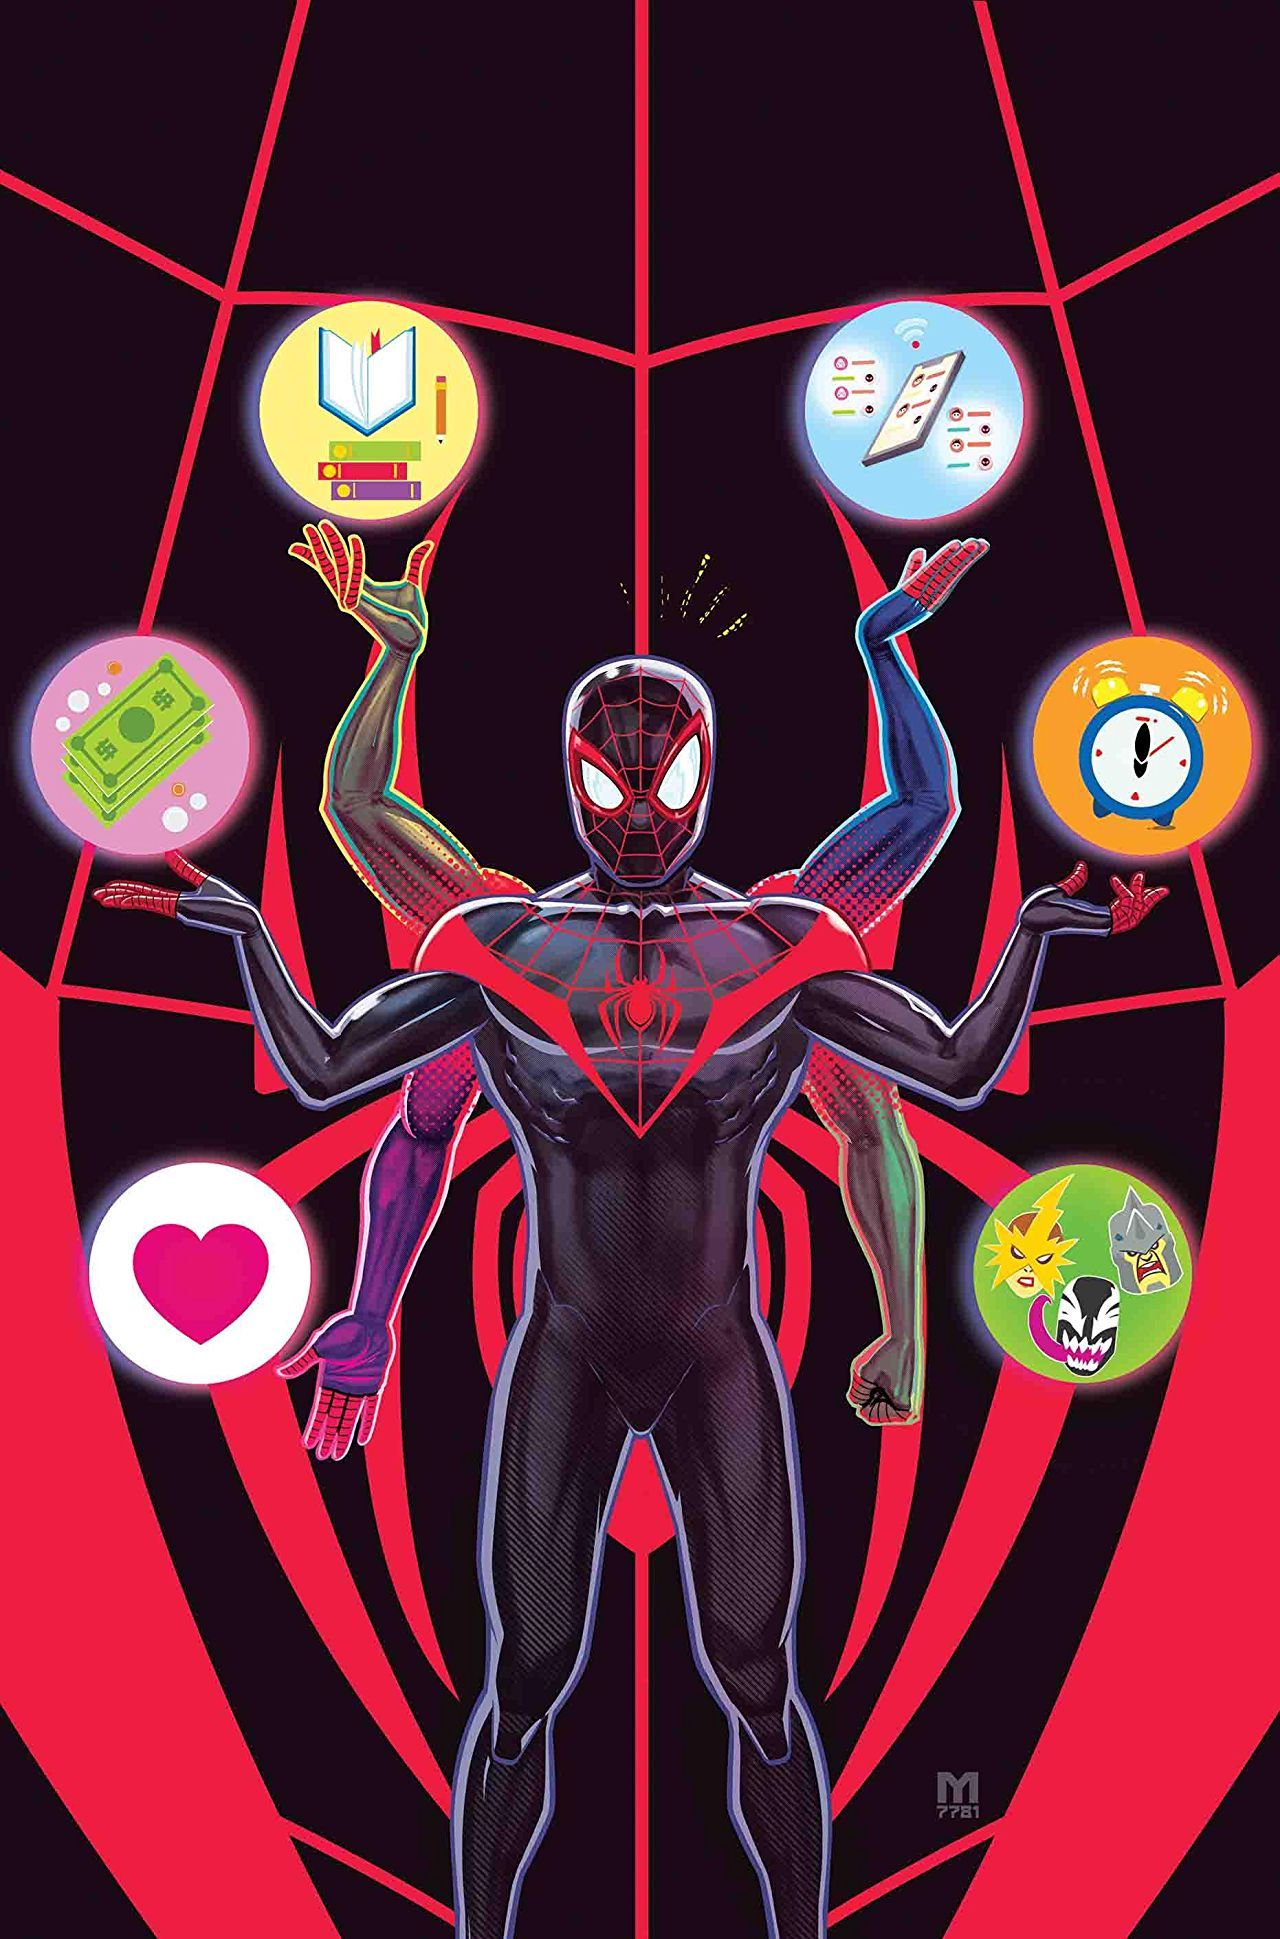 Miles morales spiderman 2018 2 spiderman spider